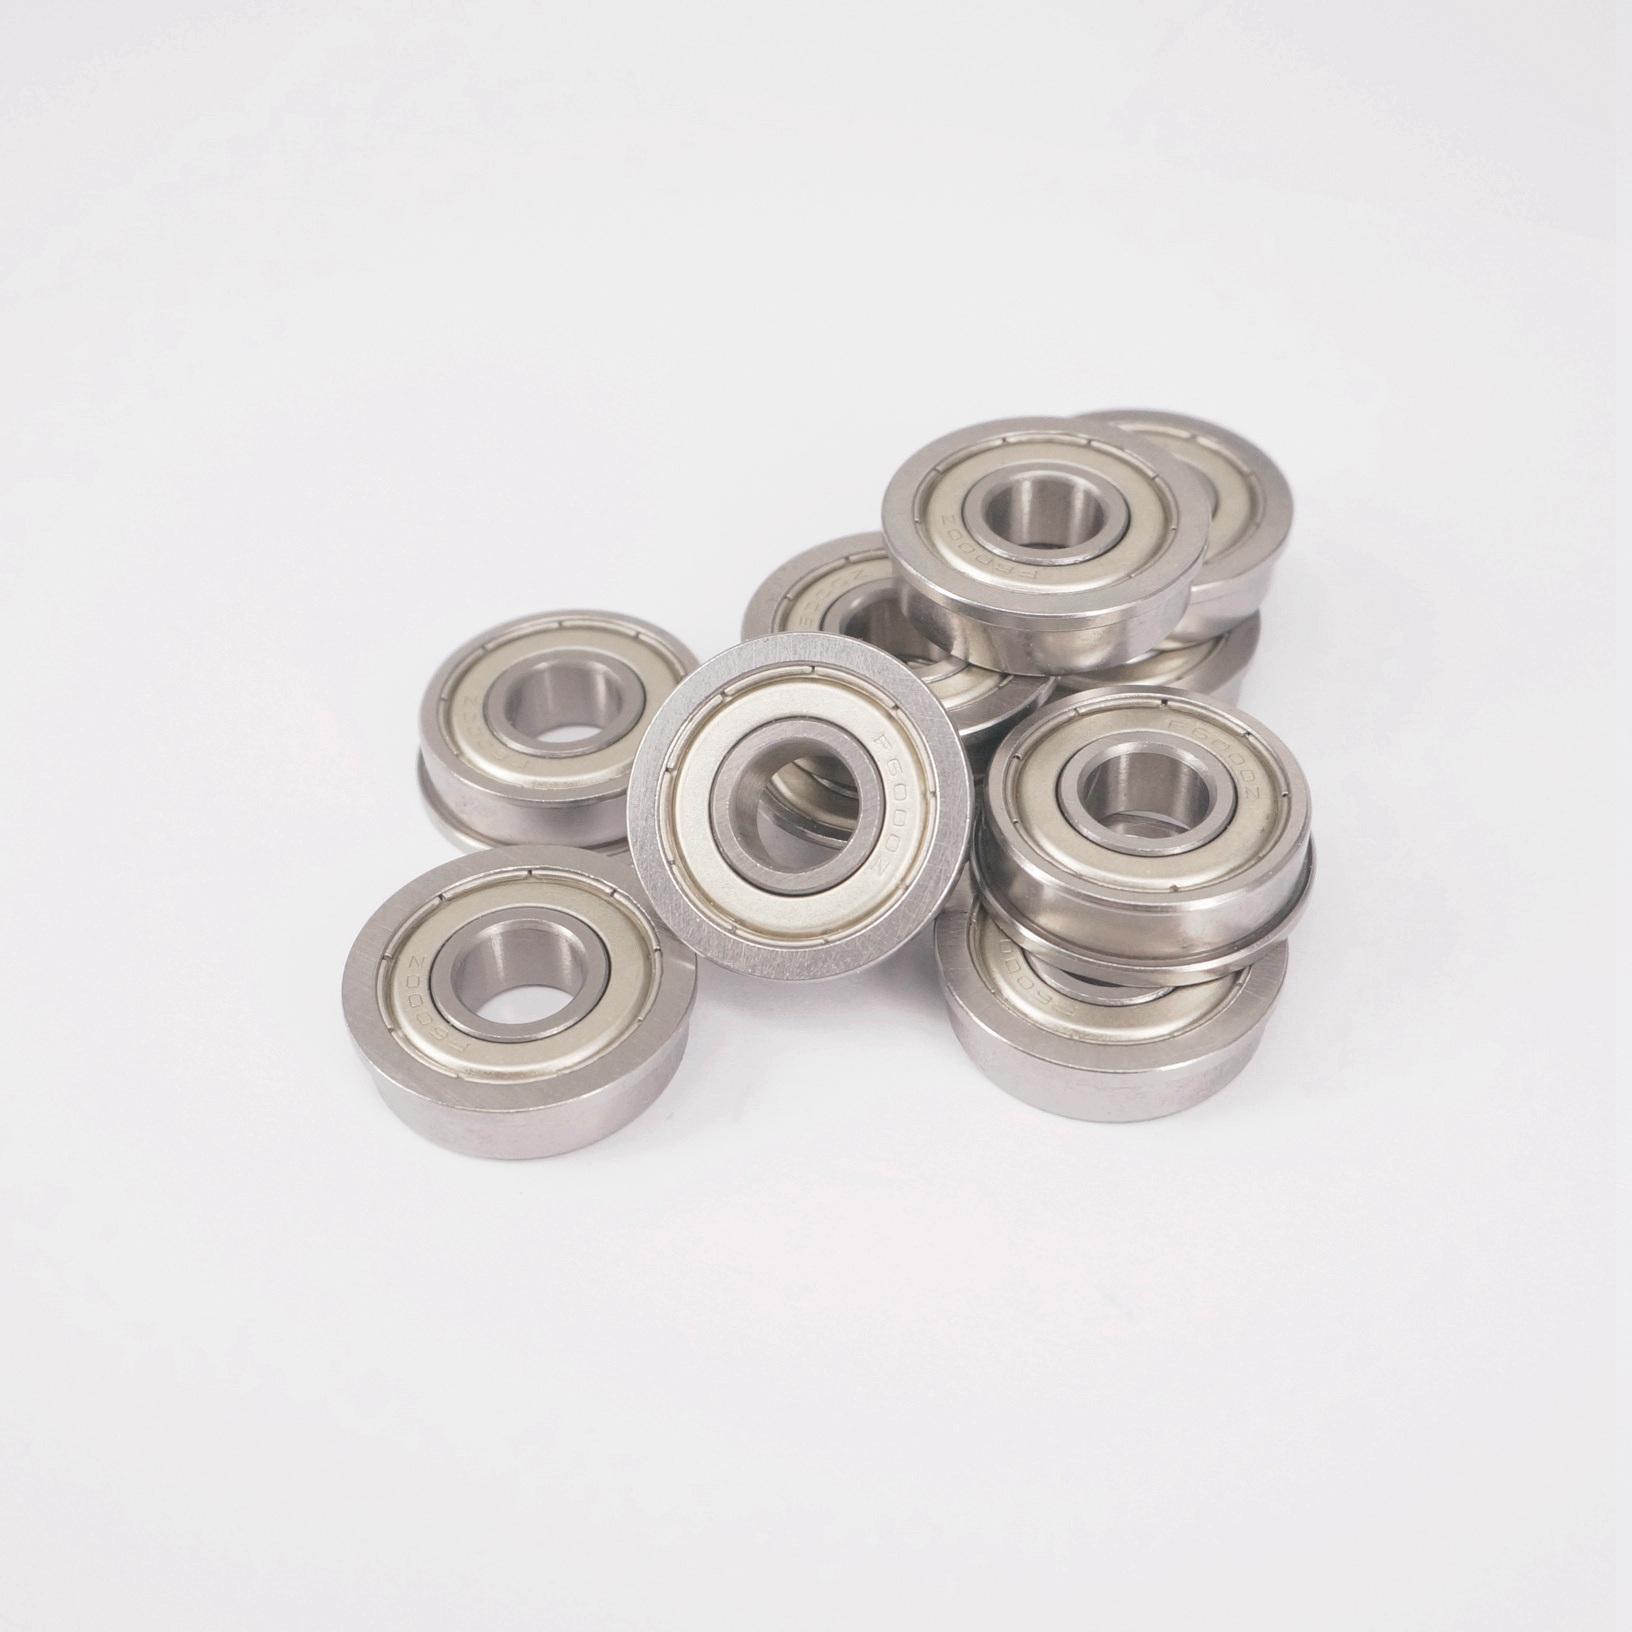 10pcs 686ZZ 6x13x5mm ABEC1 Thin-wall Shielded Deep Groove Ball Bearing